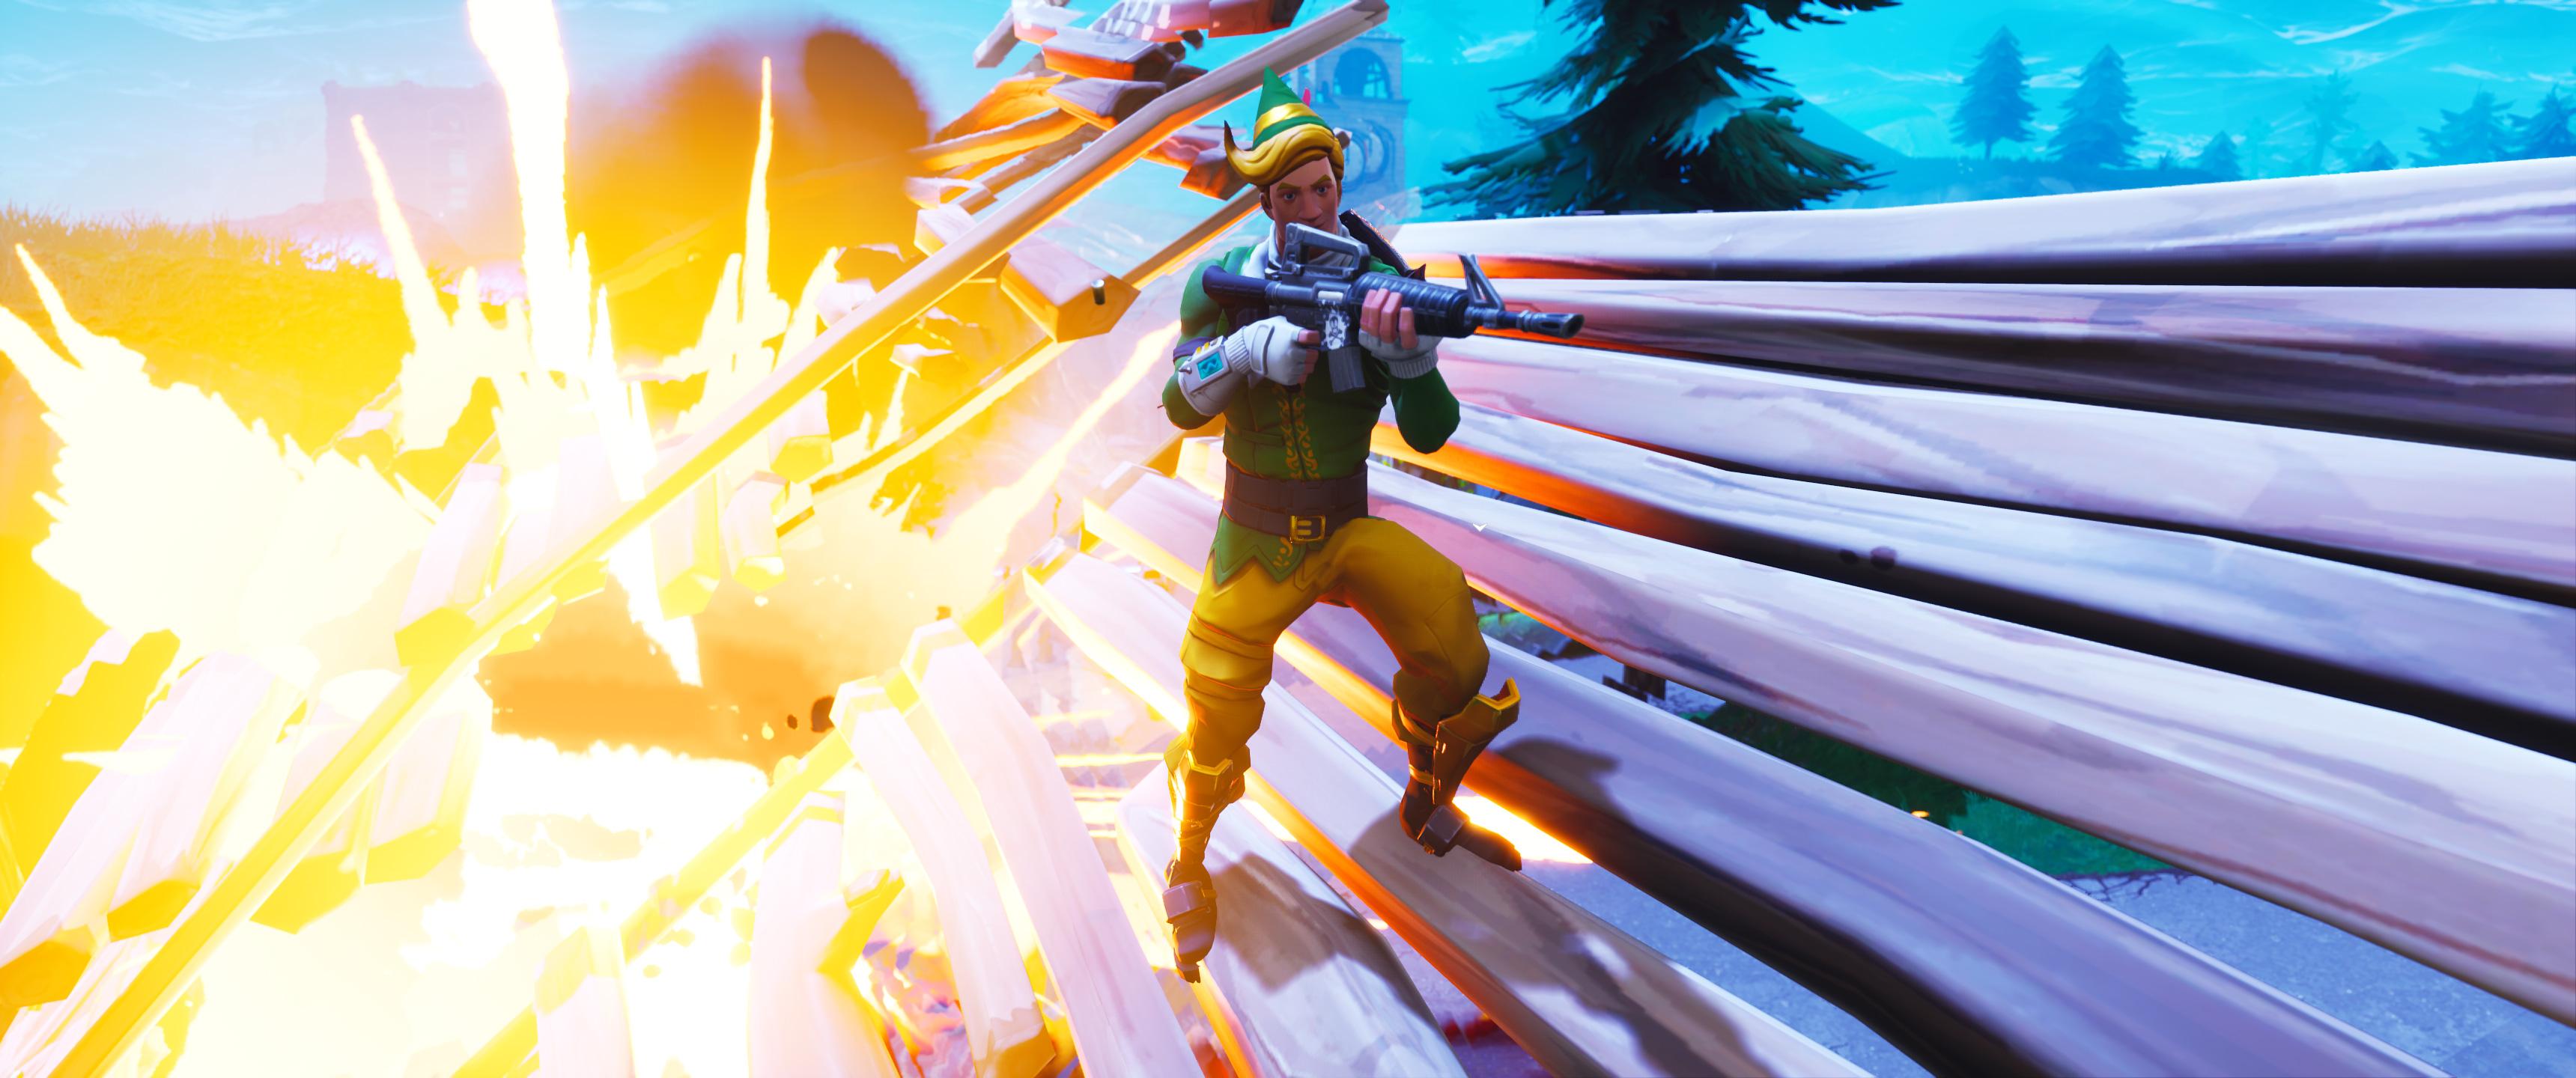 Fortnite Battle Royale Hd Games 4k Wallpapers Images Backgrounds